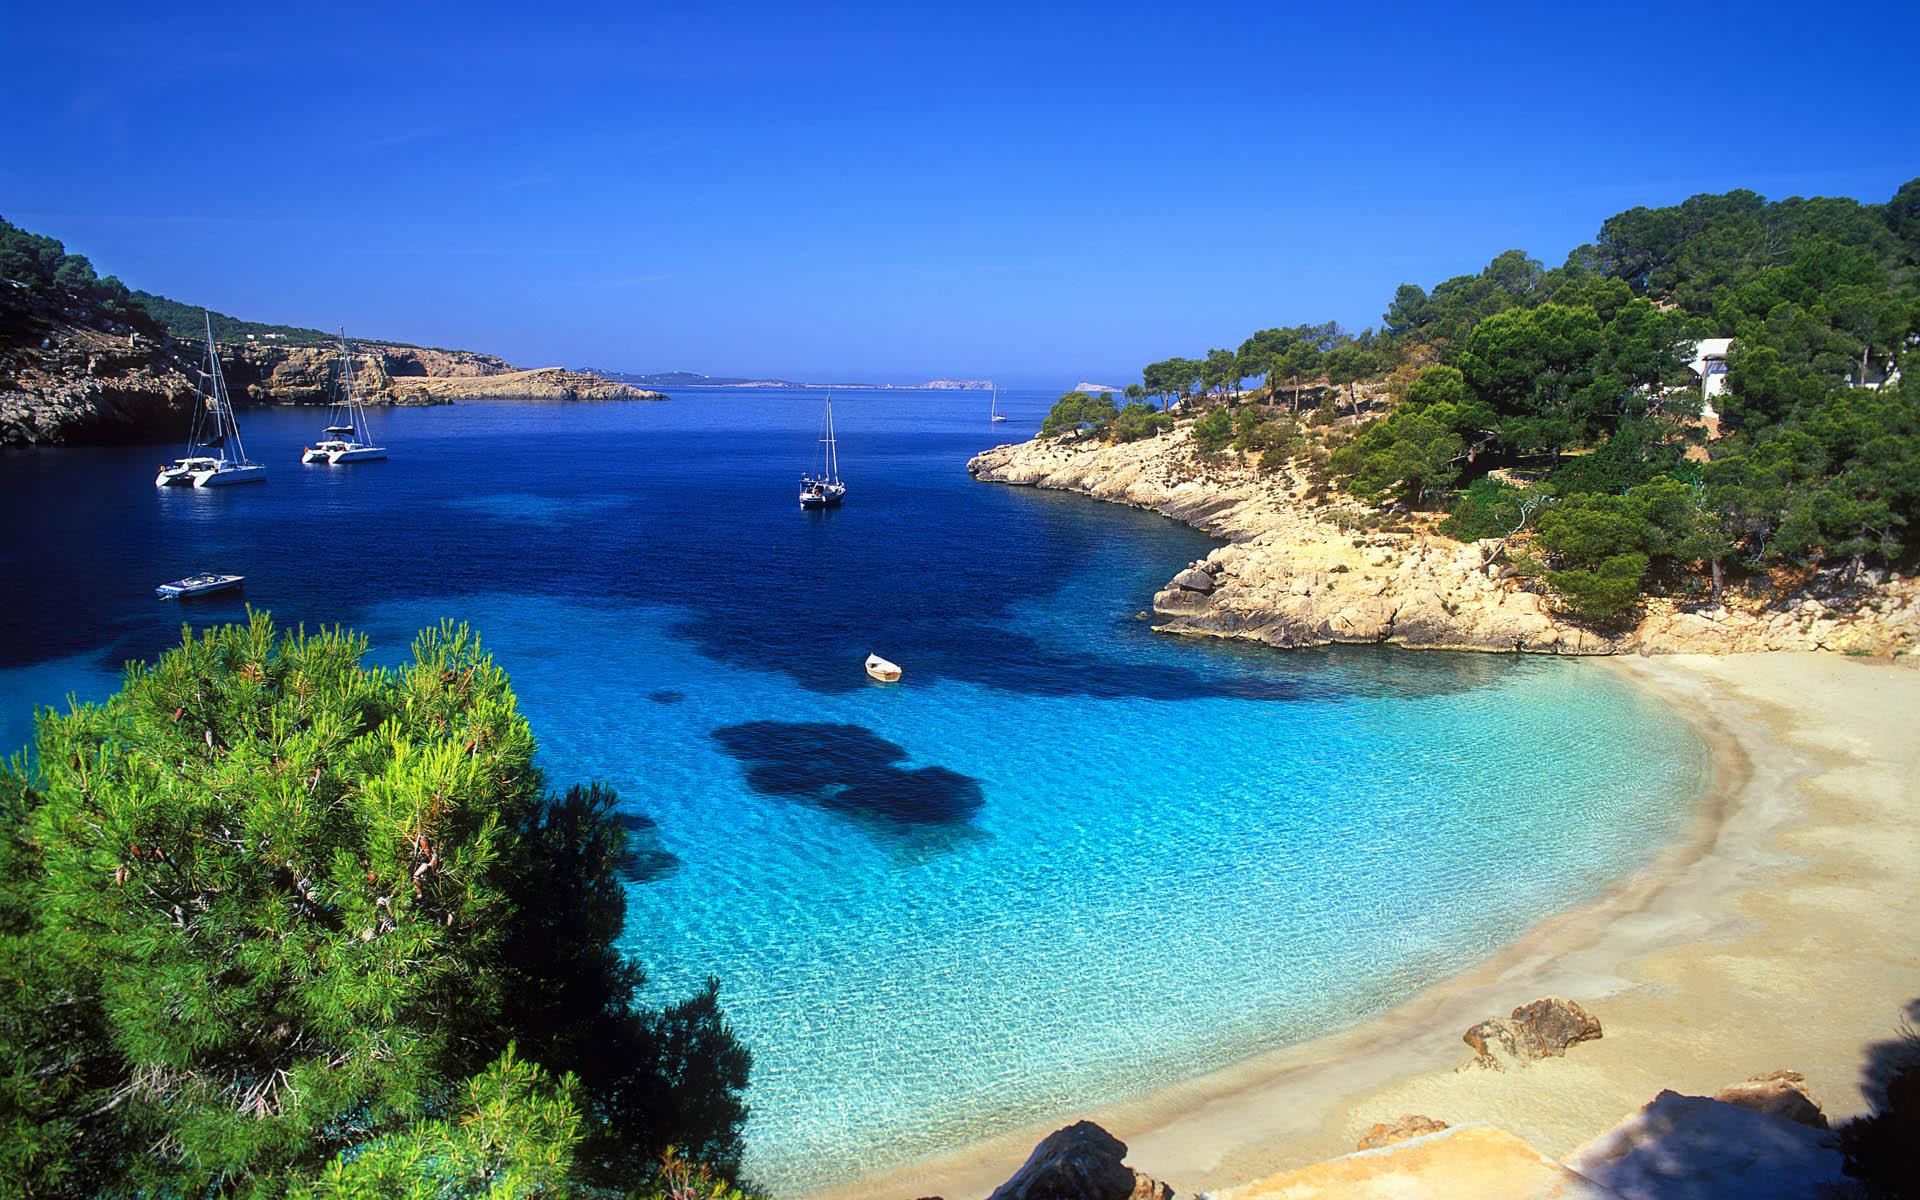 spain-yacht-charterspain-yacht-rental-spain-boat-charter-spain-boat-rental-spain-sailing-charter--6-days-route-itinerary-baleares-balearic-islands